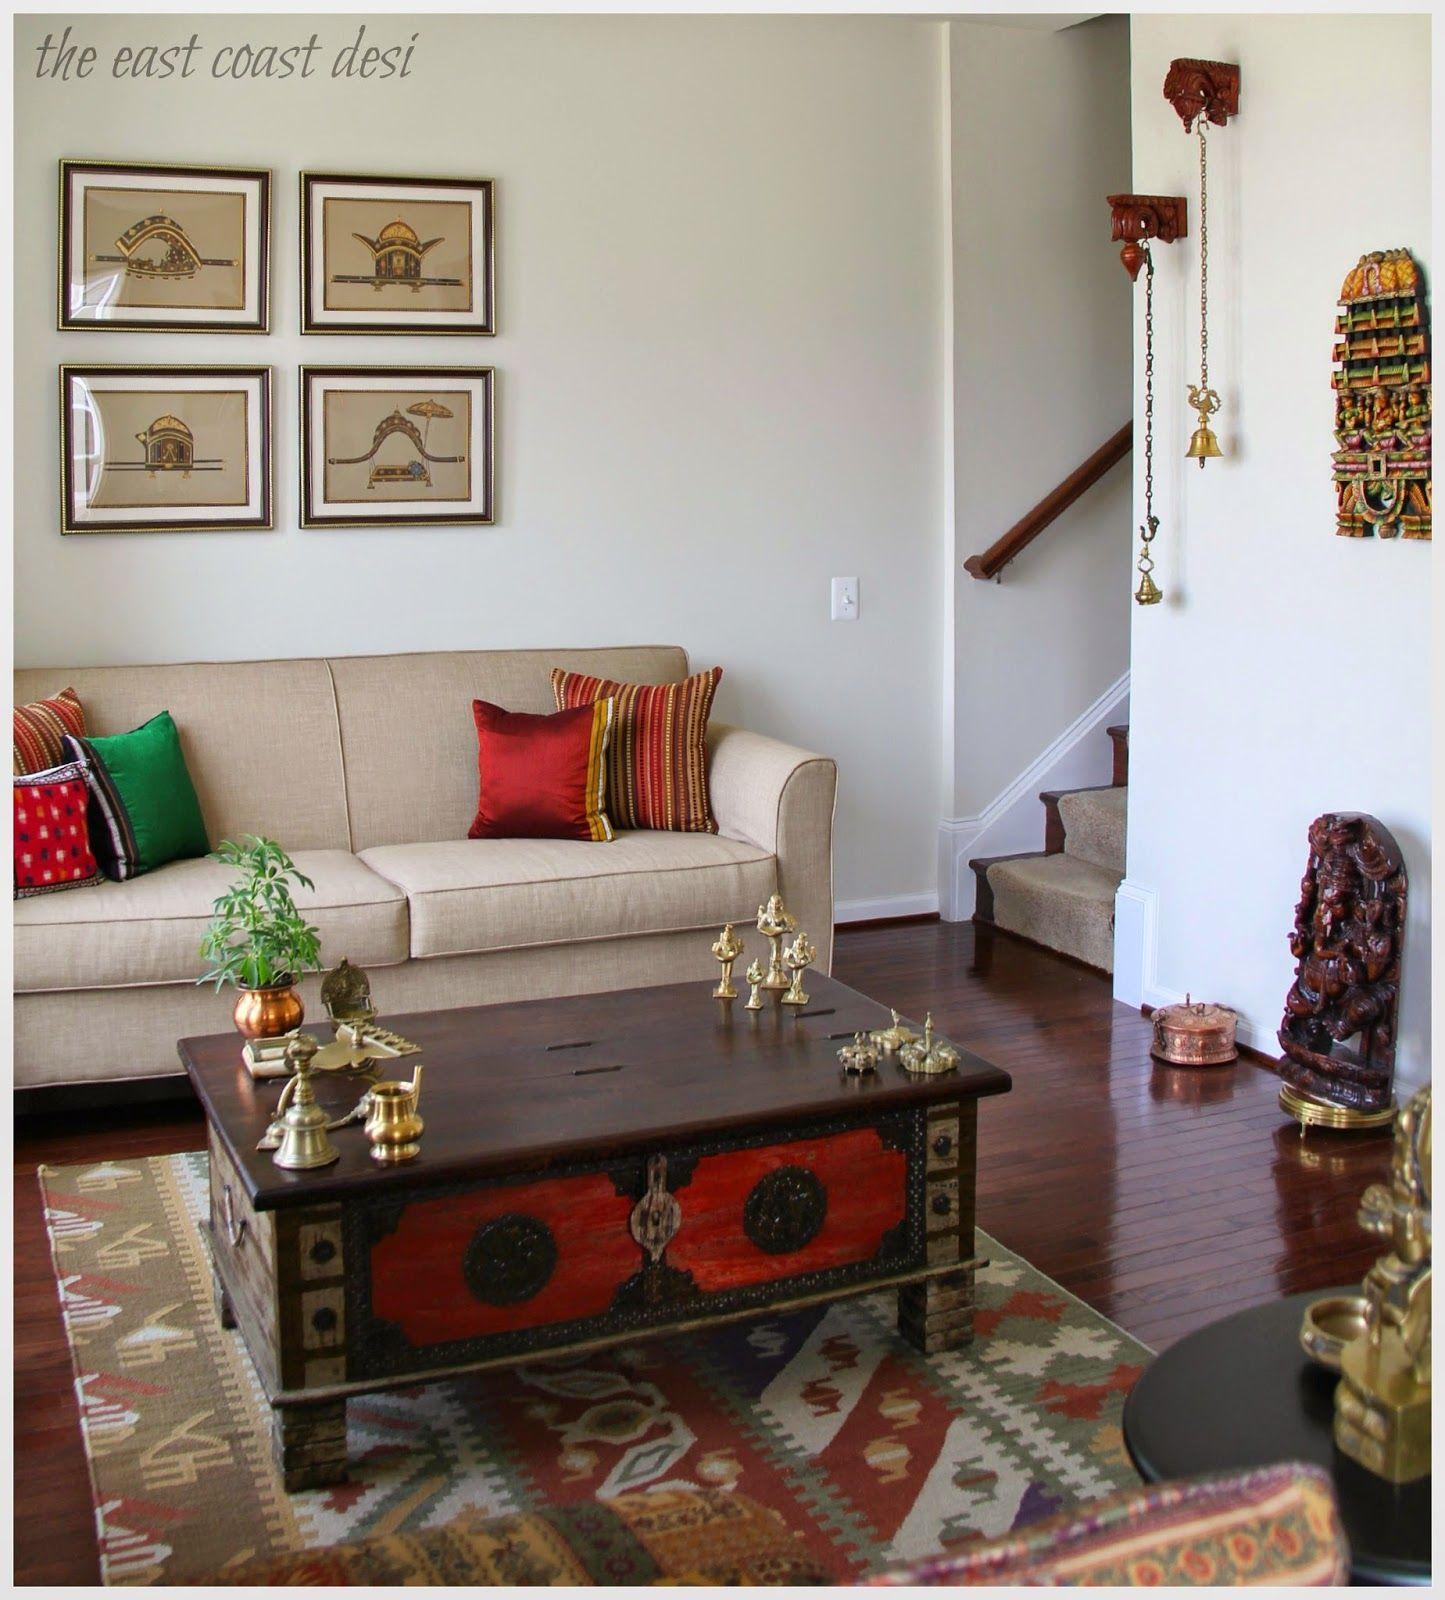 The East Coast Desi Home Decor Home Decor Pinterest East Coast Living Rooms And Woods